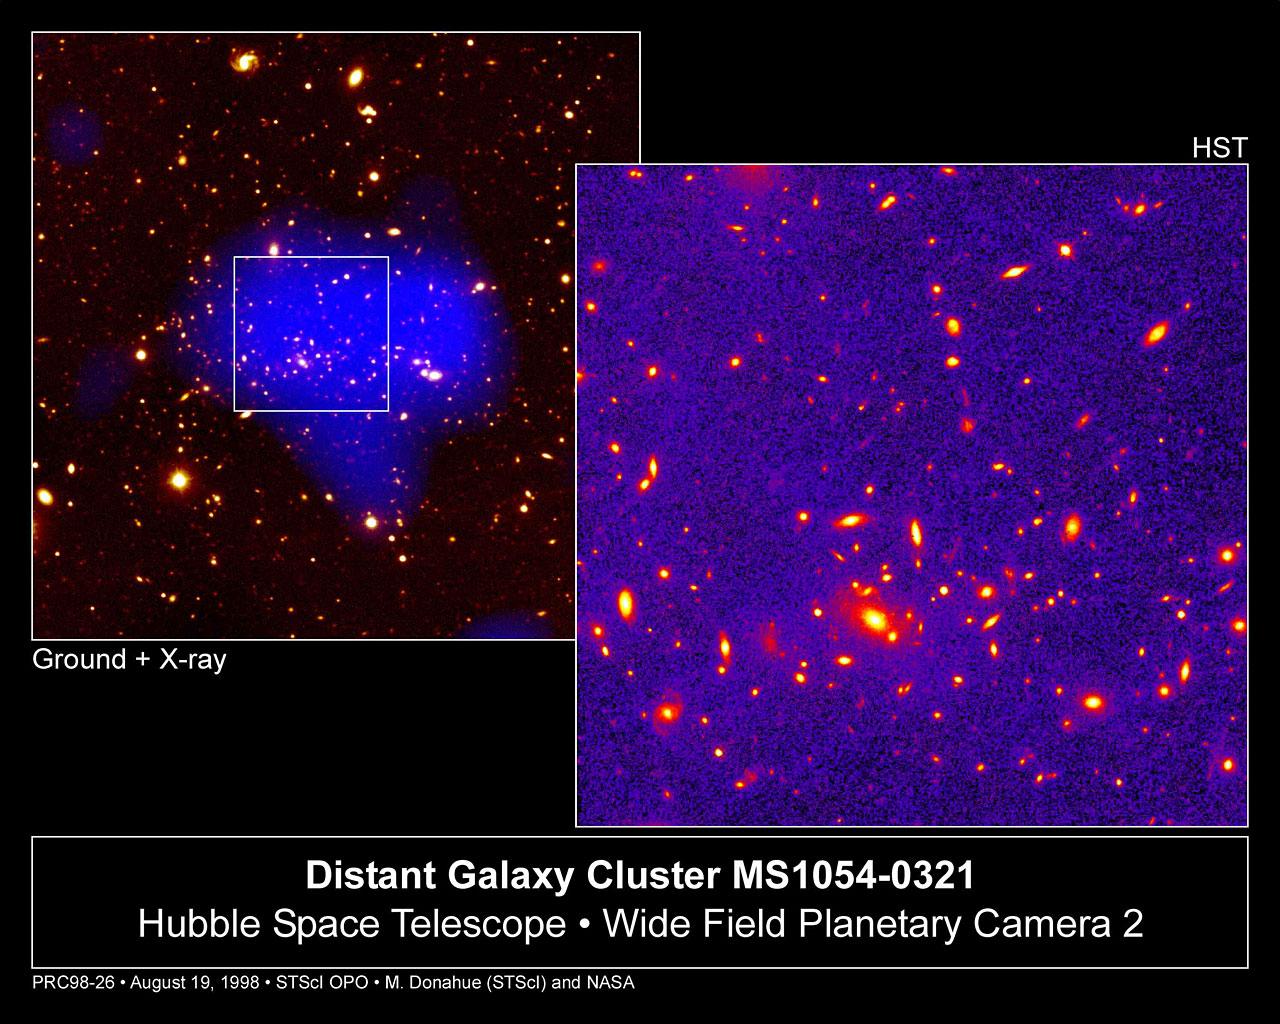 Telescopes Unveil View Of Remote, Massive Galaxy Cluster